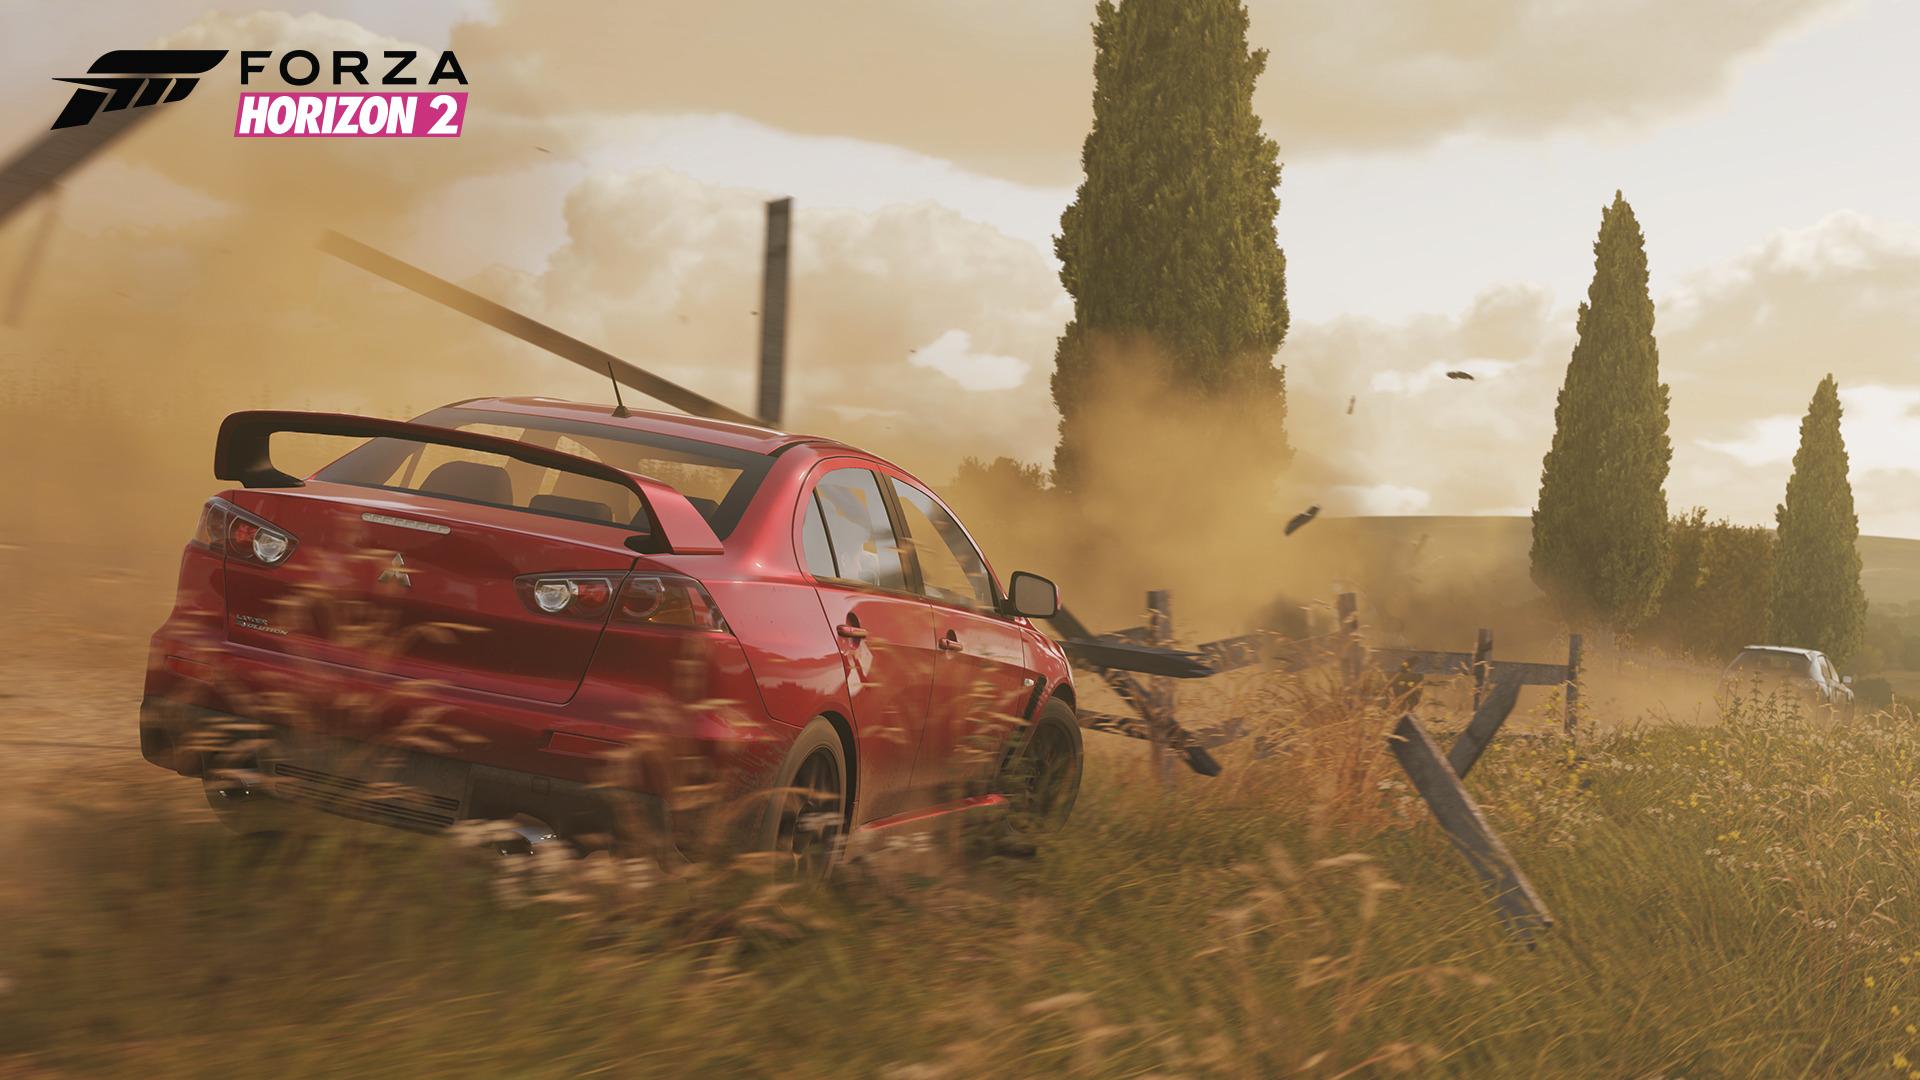 Forza Horizon 2 Xbox One 4 ForzaMotorsport.fr